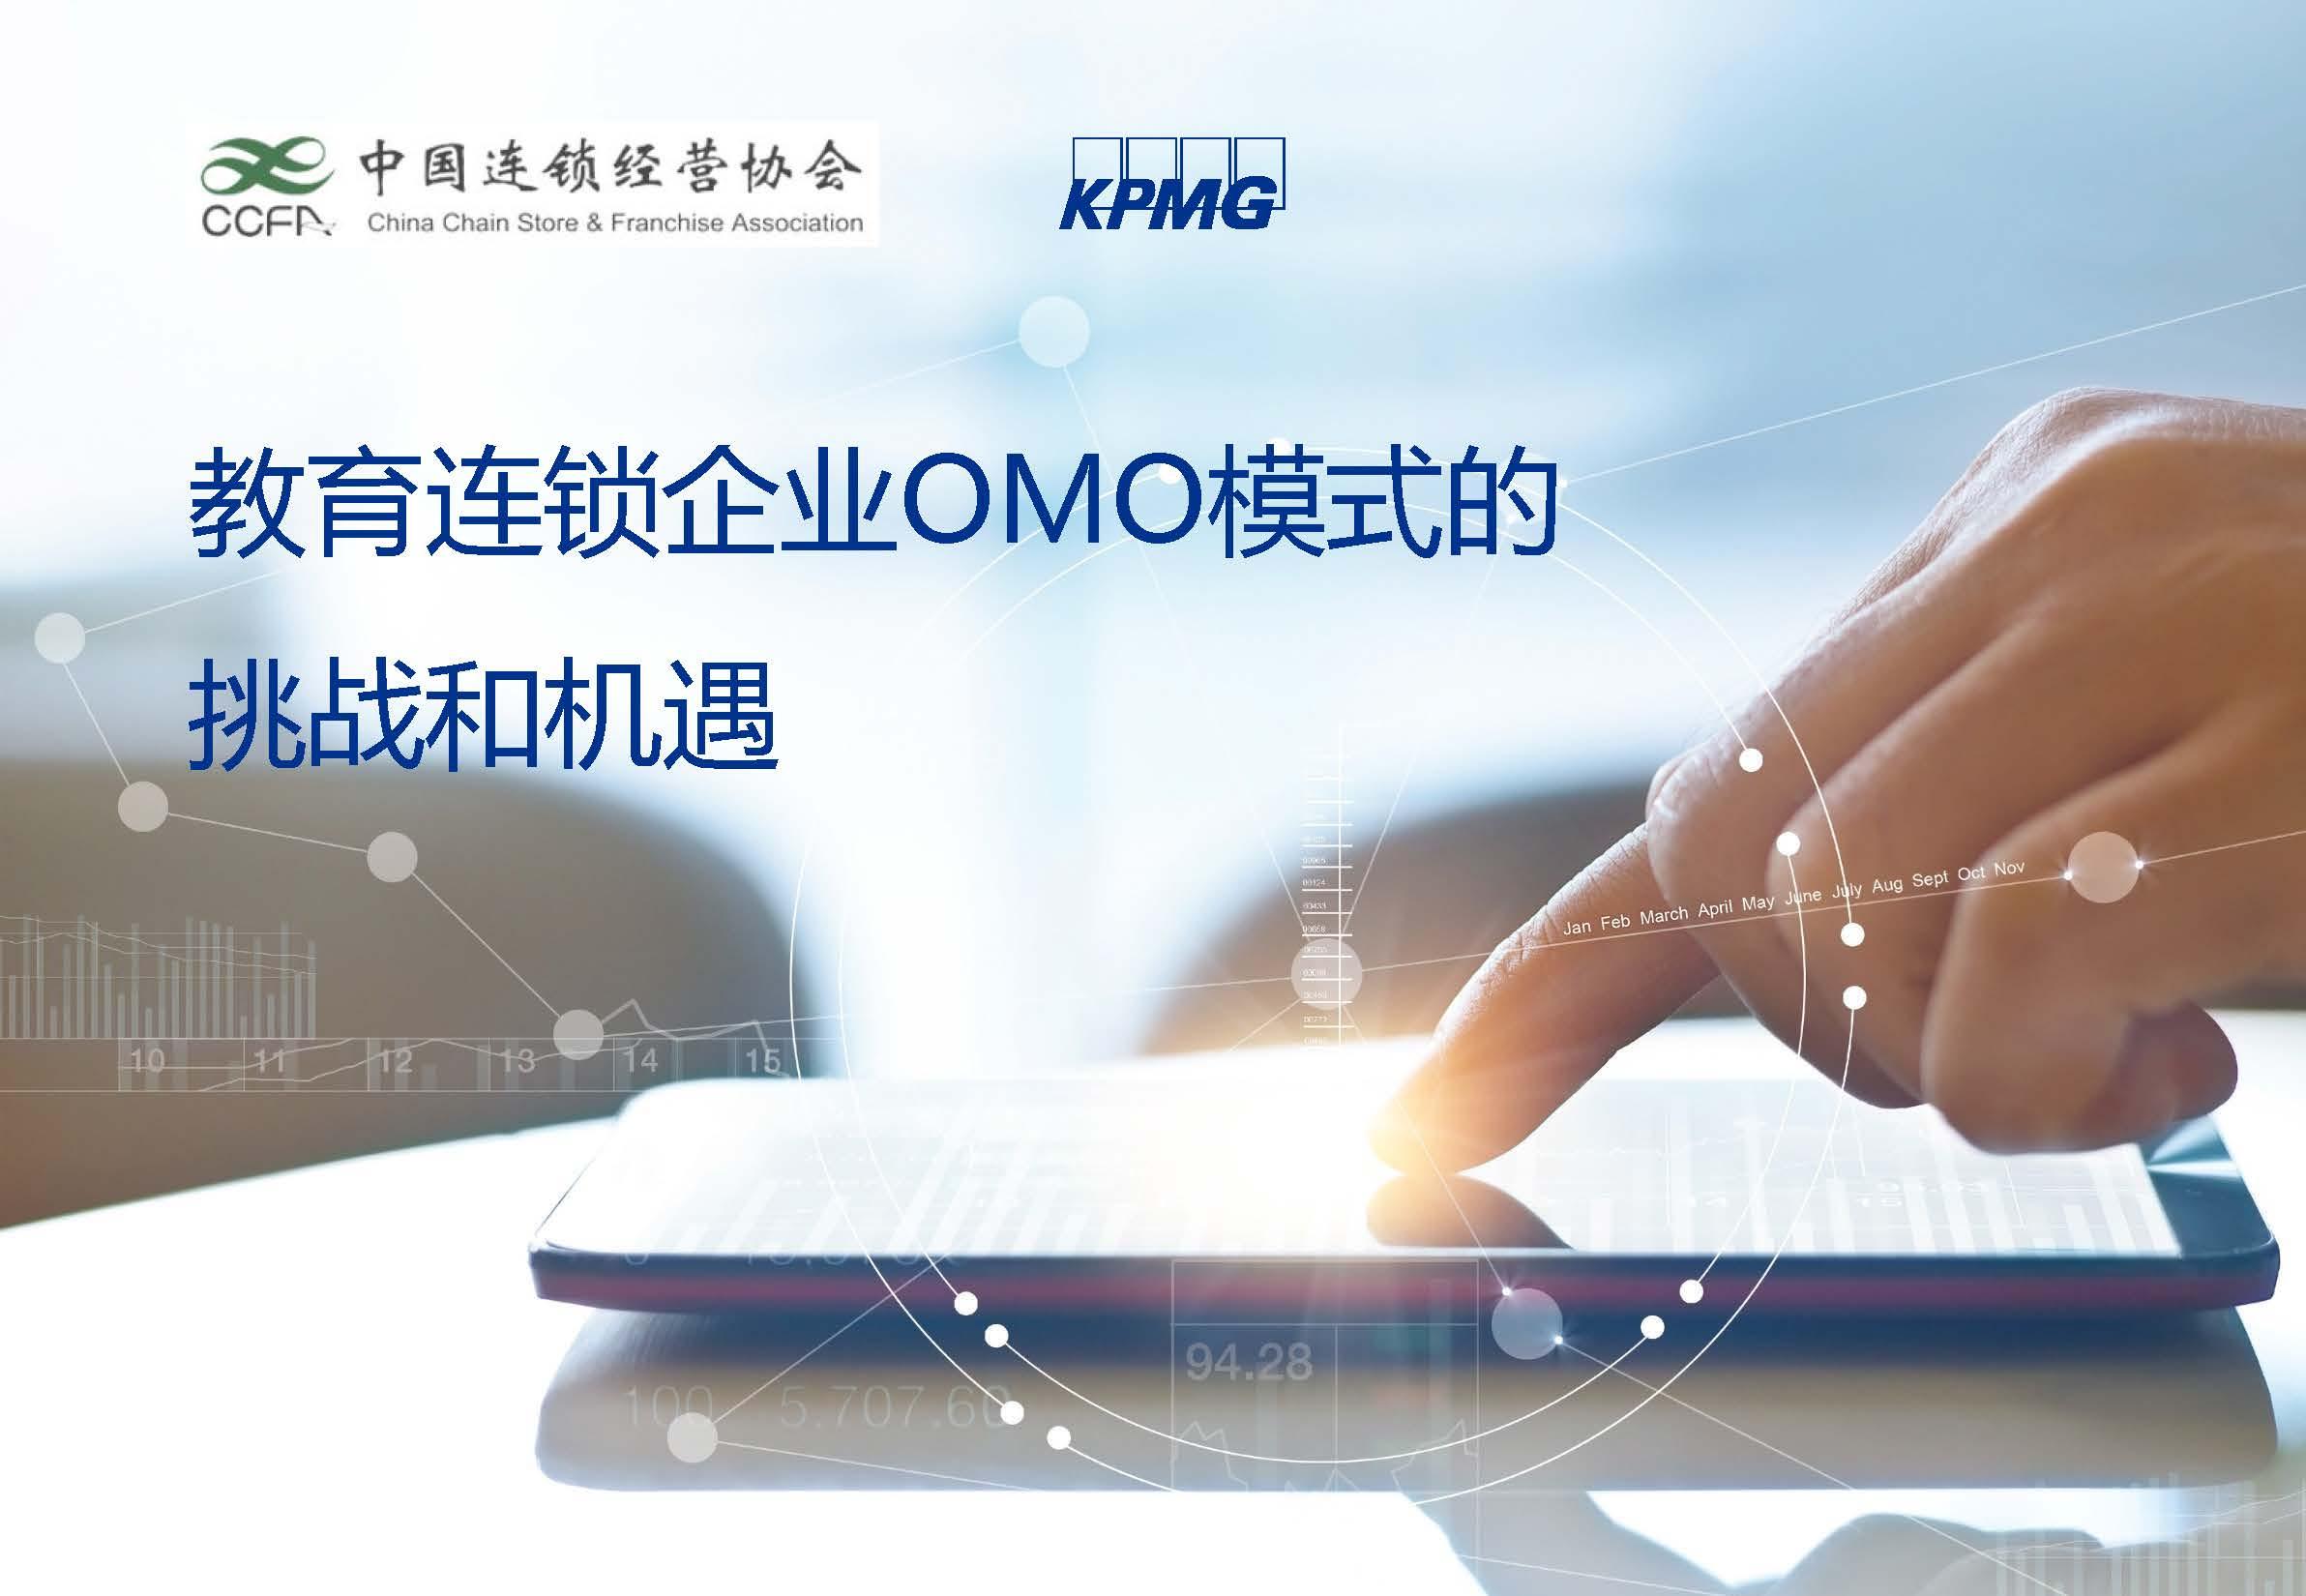 CCFA&毕马威:教育连锁企业OMO模式的挑战和机遇报告(附下载地址)